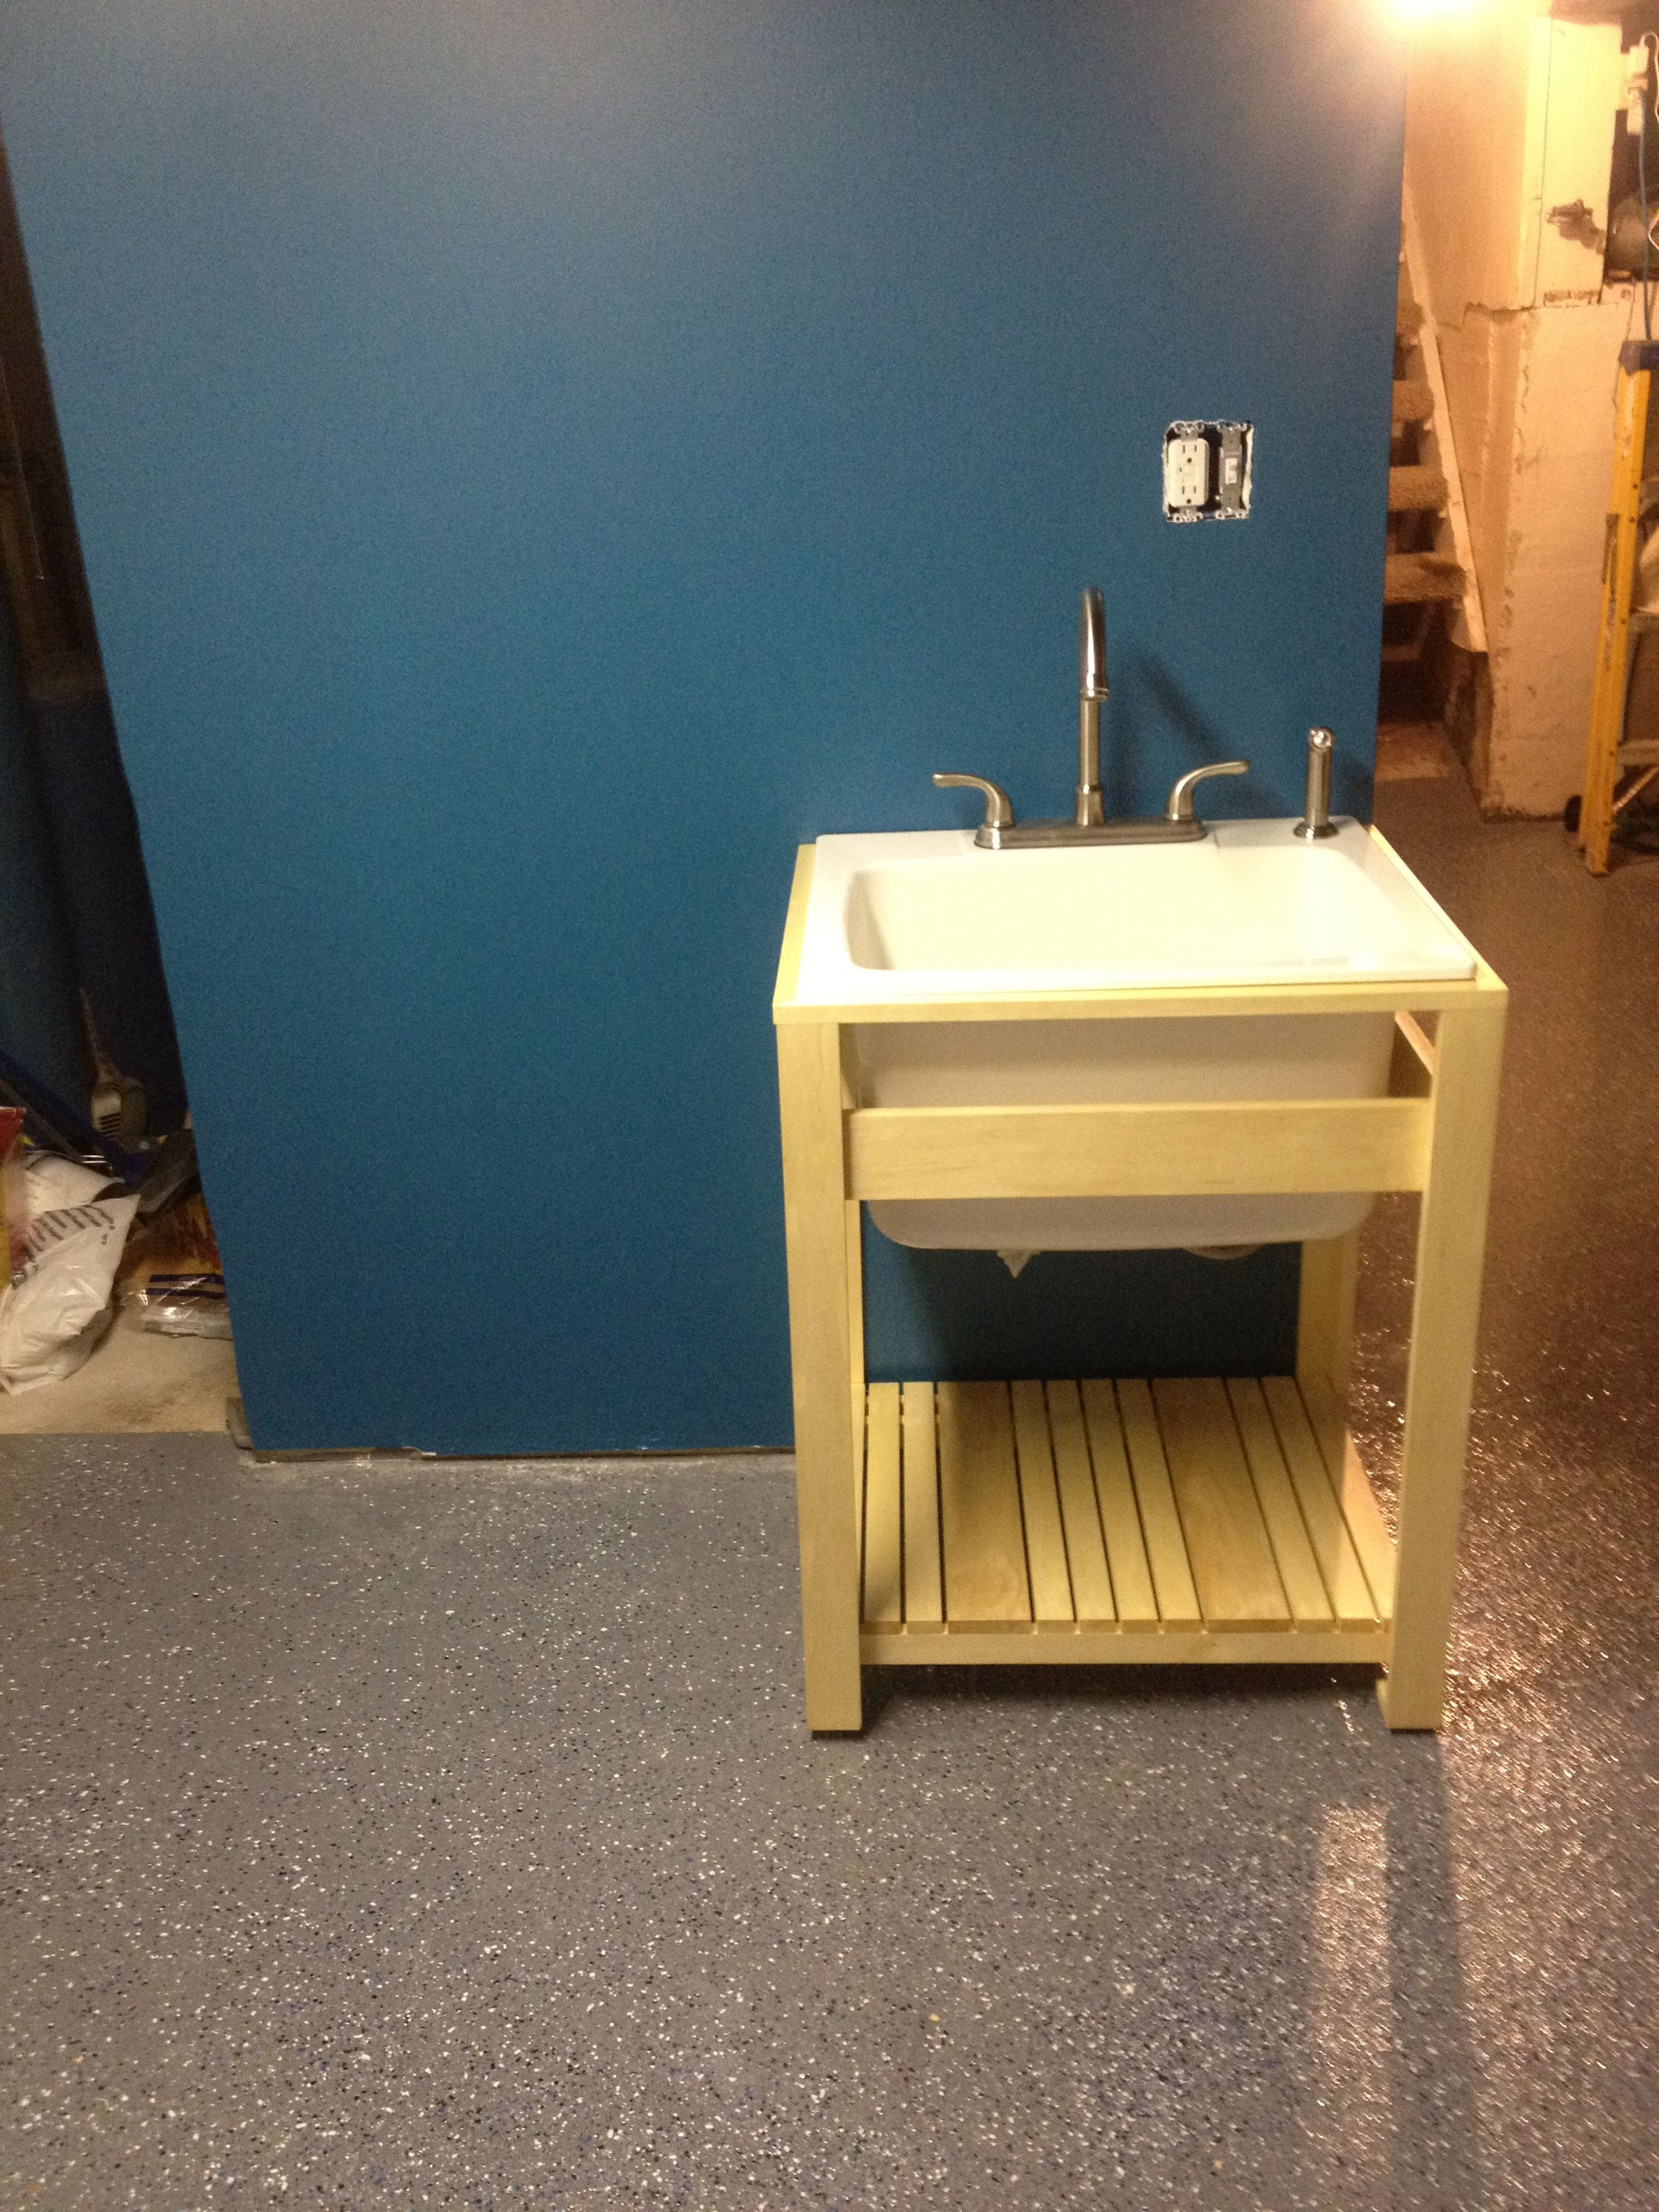 Laundry tub stand. My version inspired from similar Kohler design ...